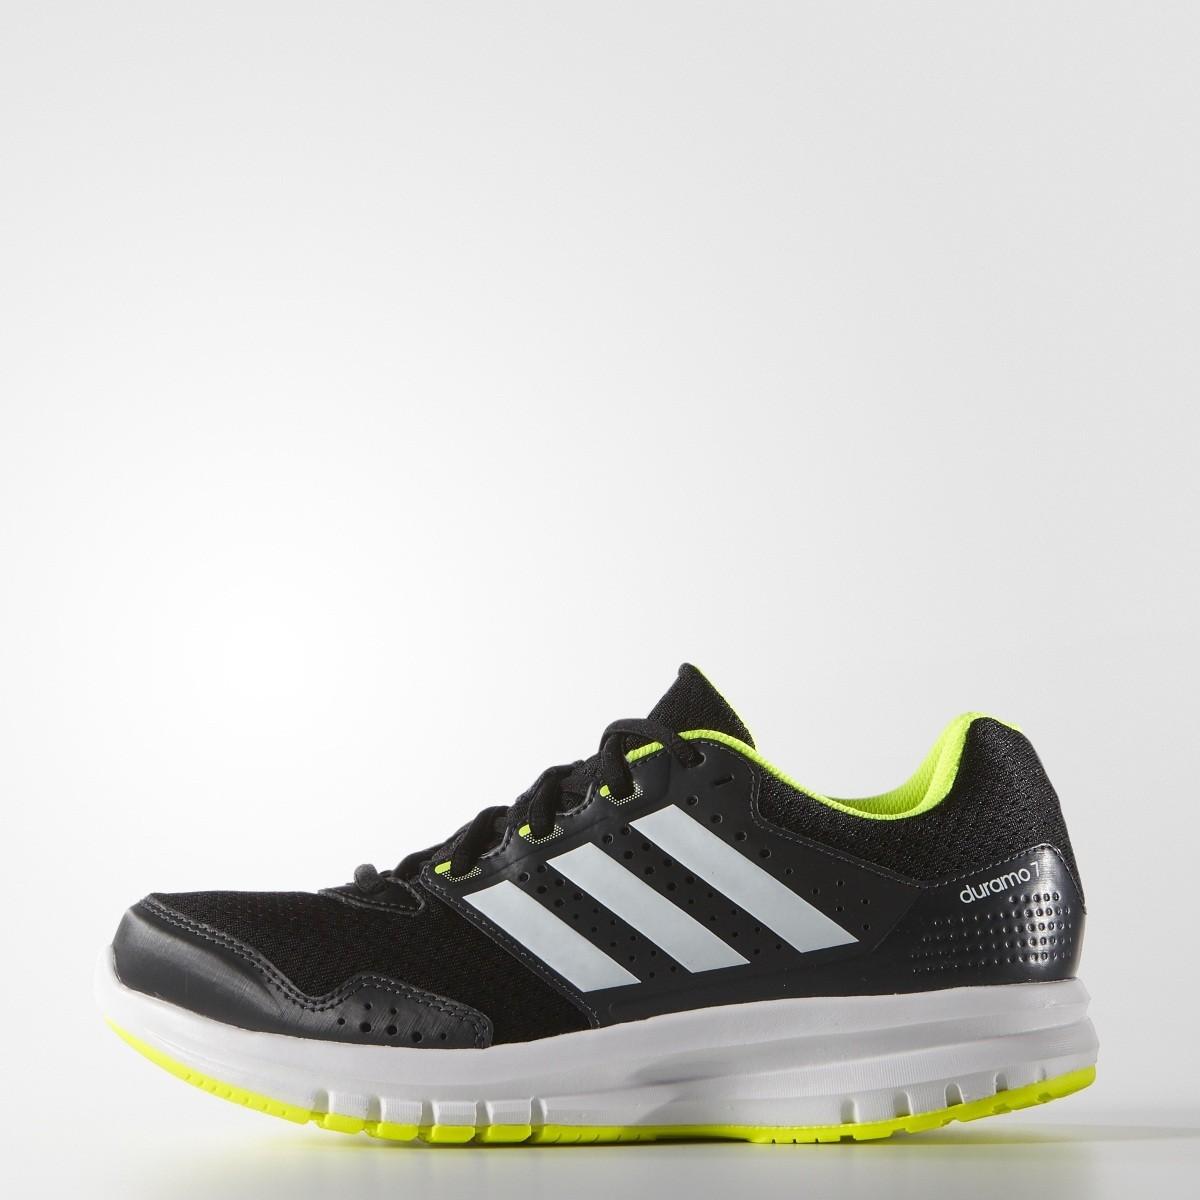 Dětské běžecké boty adidas Duramo 7 k  c3105ac184